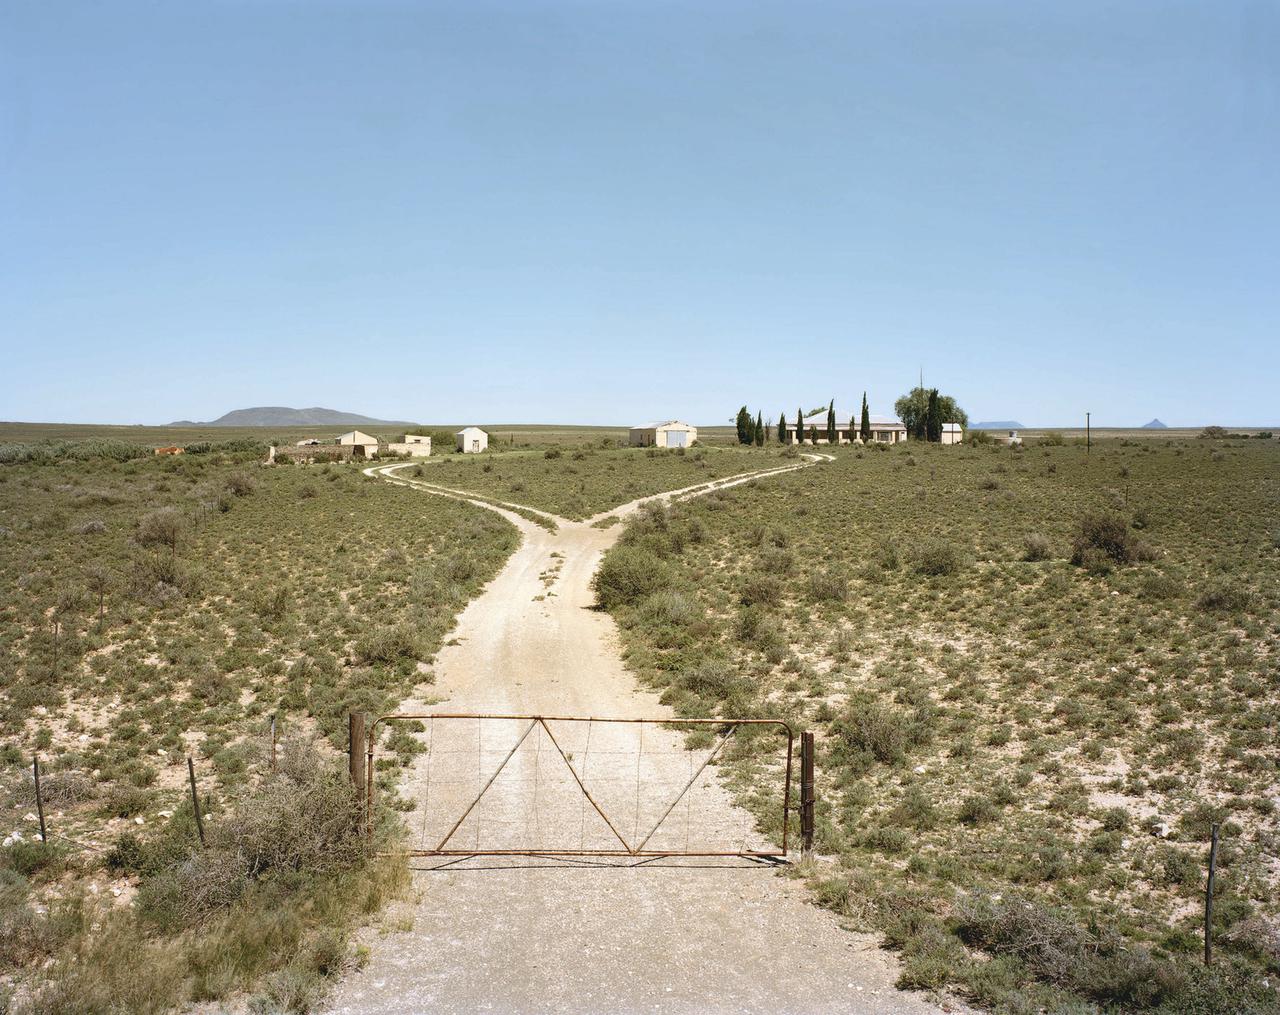 David Goldblatt, Deserted farm, Holgartsfontein, near Vosburg, Northern Cape. 16. March 2008 (all photographs courtesy the artist and Steidl)